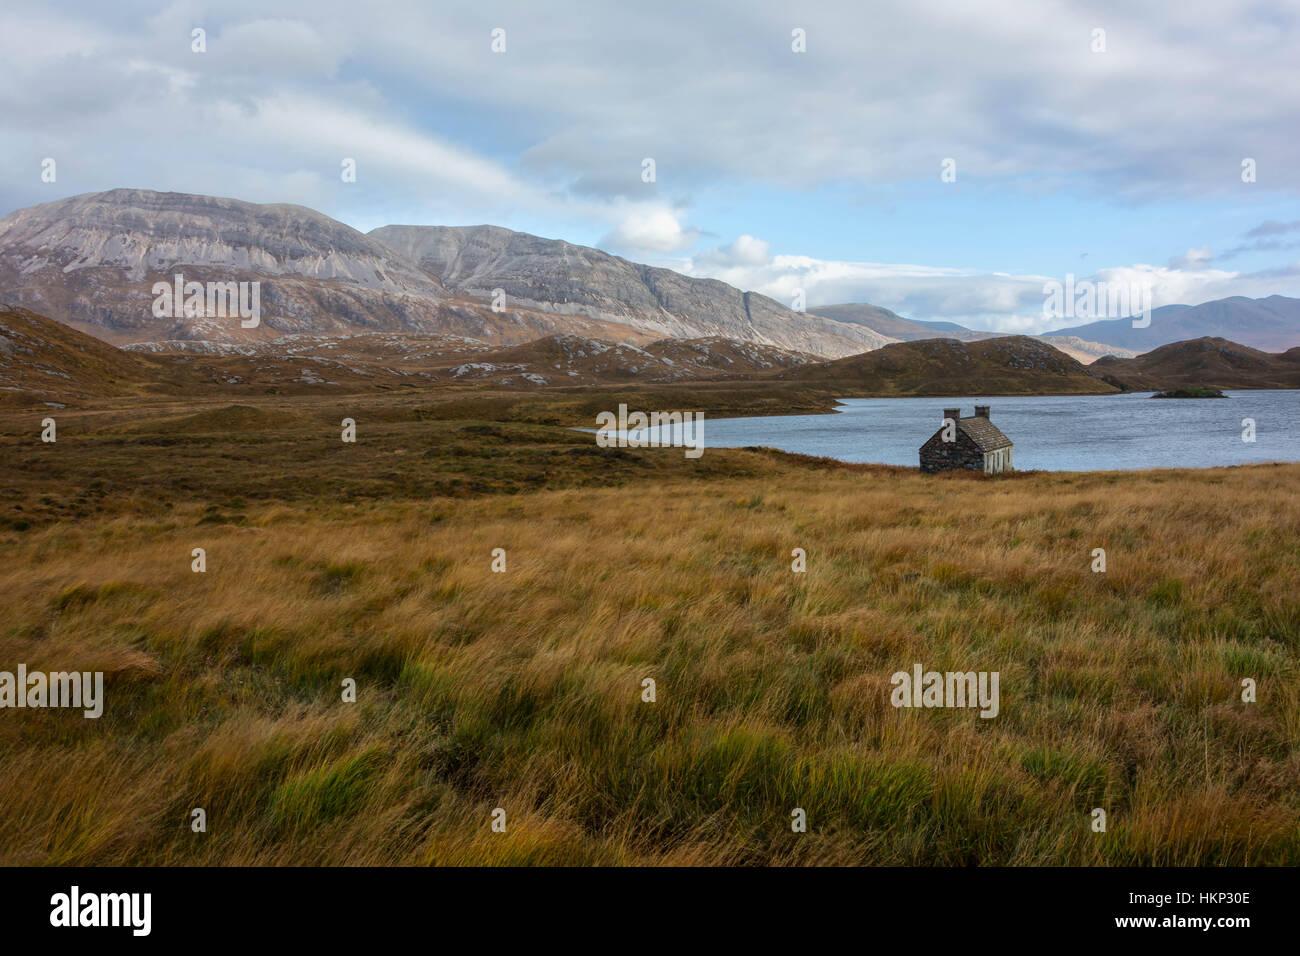 Loch stack, Sutherland, Scotland, united kingdom Photo Stock